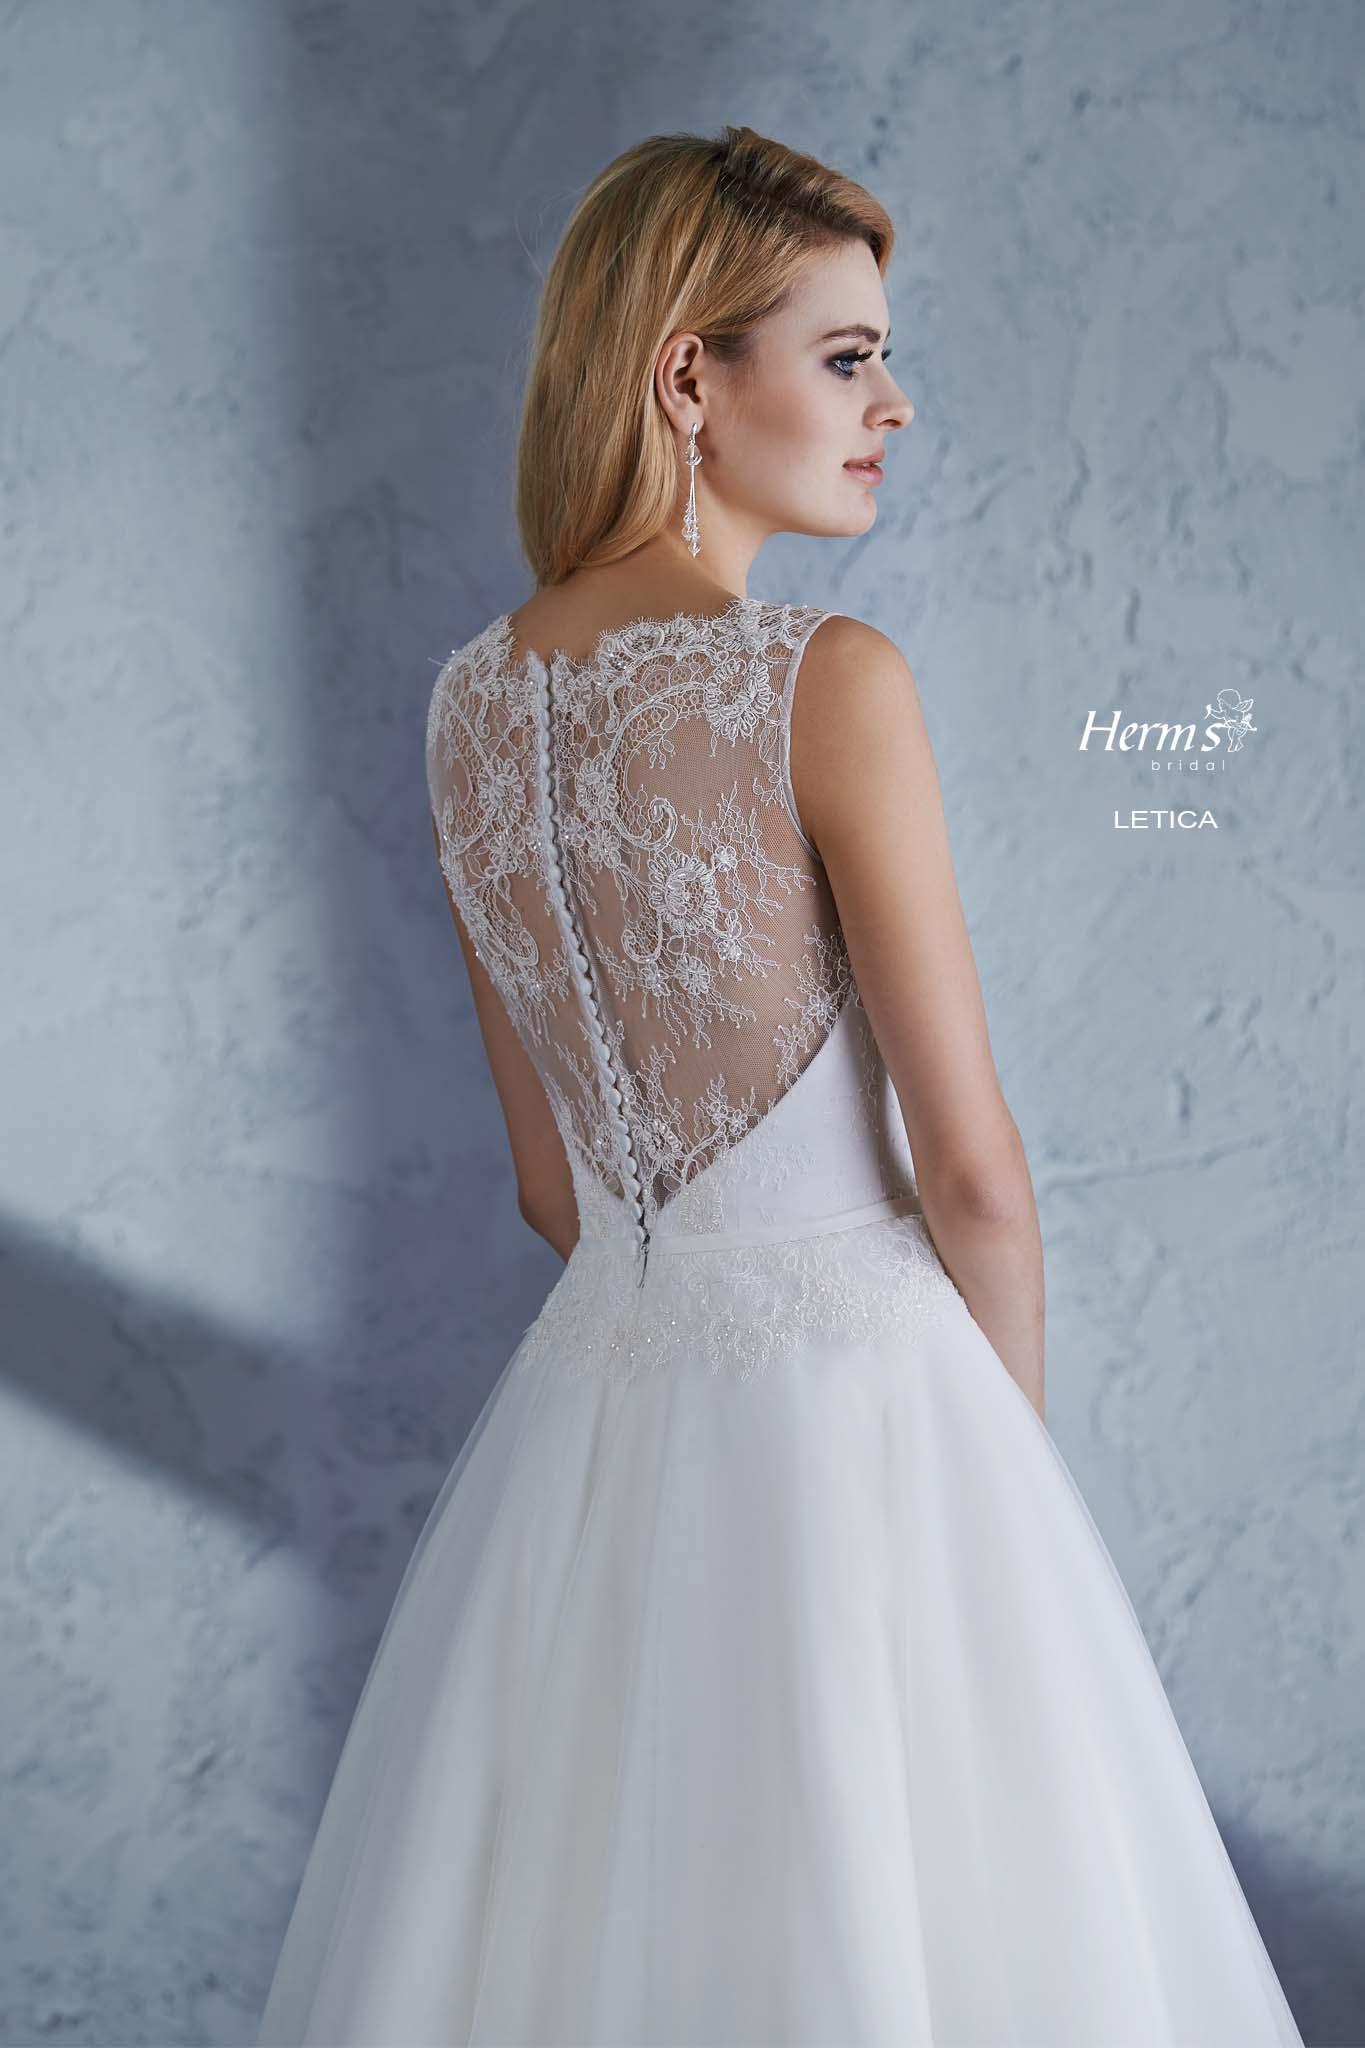 wedding dress Herm's Bridal Letica